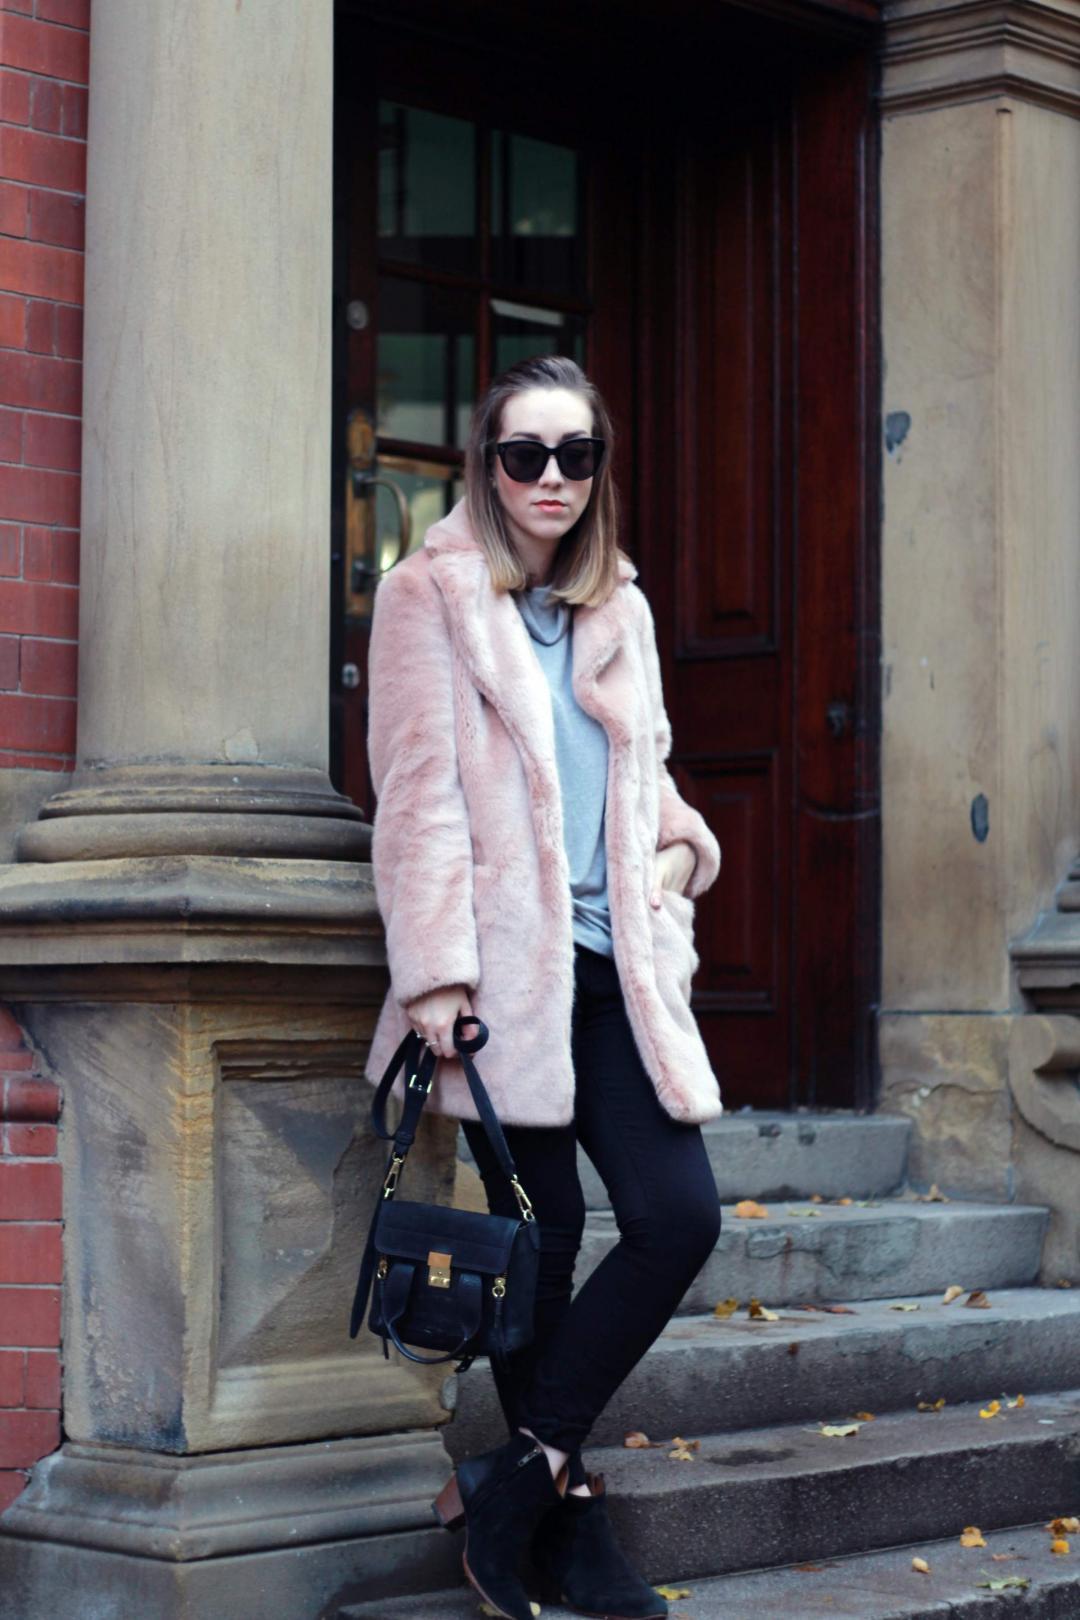 reiss-alba-pink-faux-fur-coat-phillip-lim-pashli-isabel-marant-dicker-boots-street-style-2